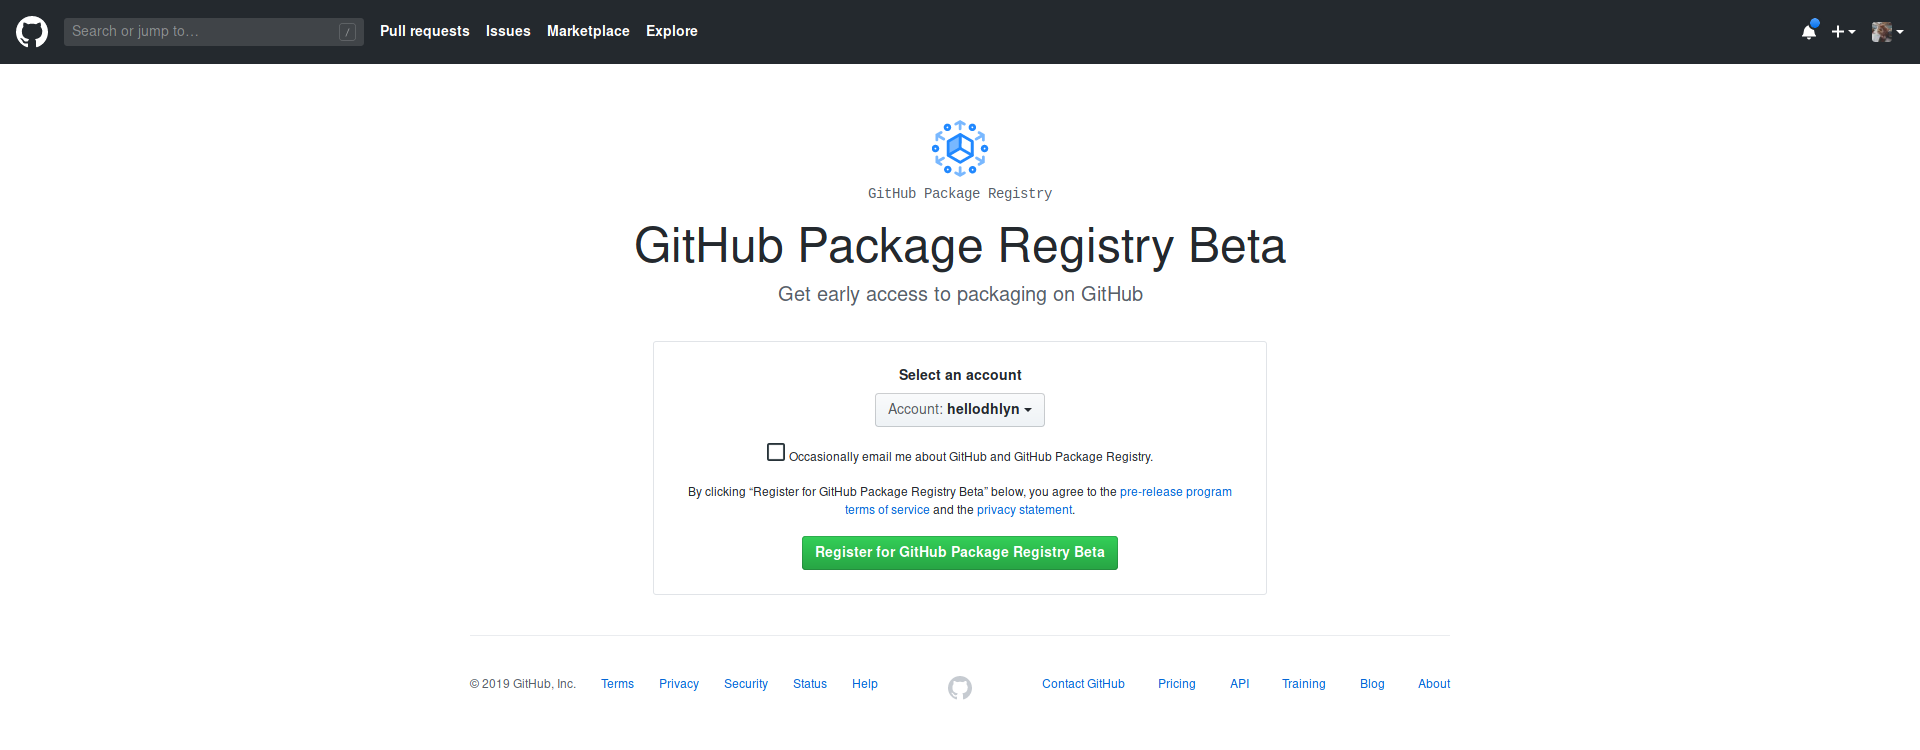 GitHub Package Registry 베타 프로그램 참여 화면